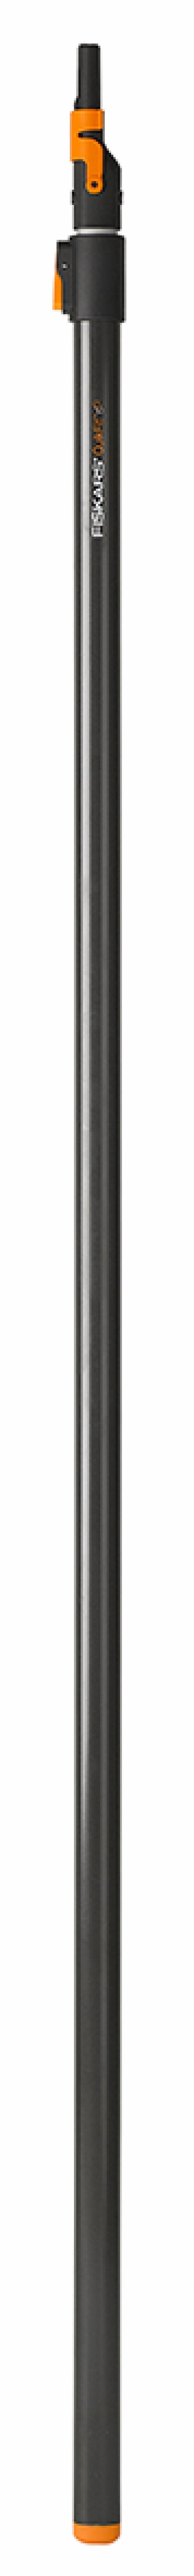 MANICO TELESCOPICO QUIKFIT FISKARS IN GRAFITE 228-400 - image